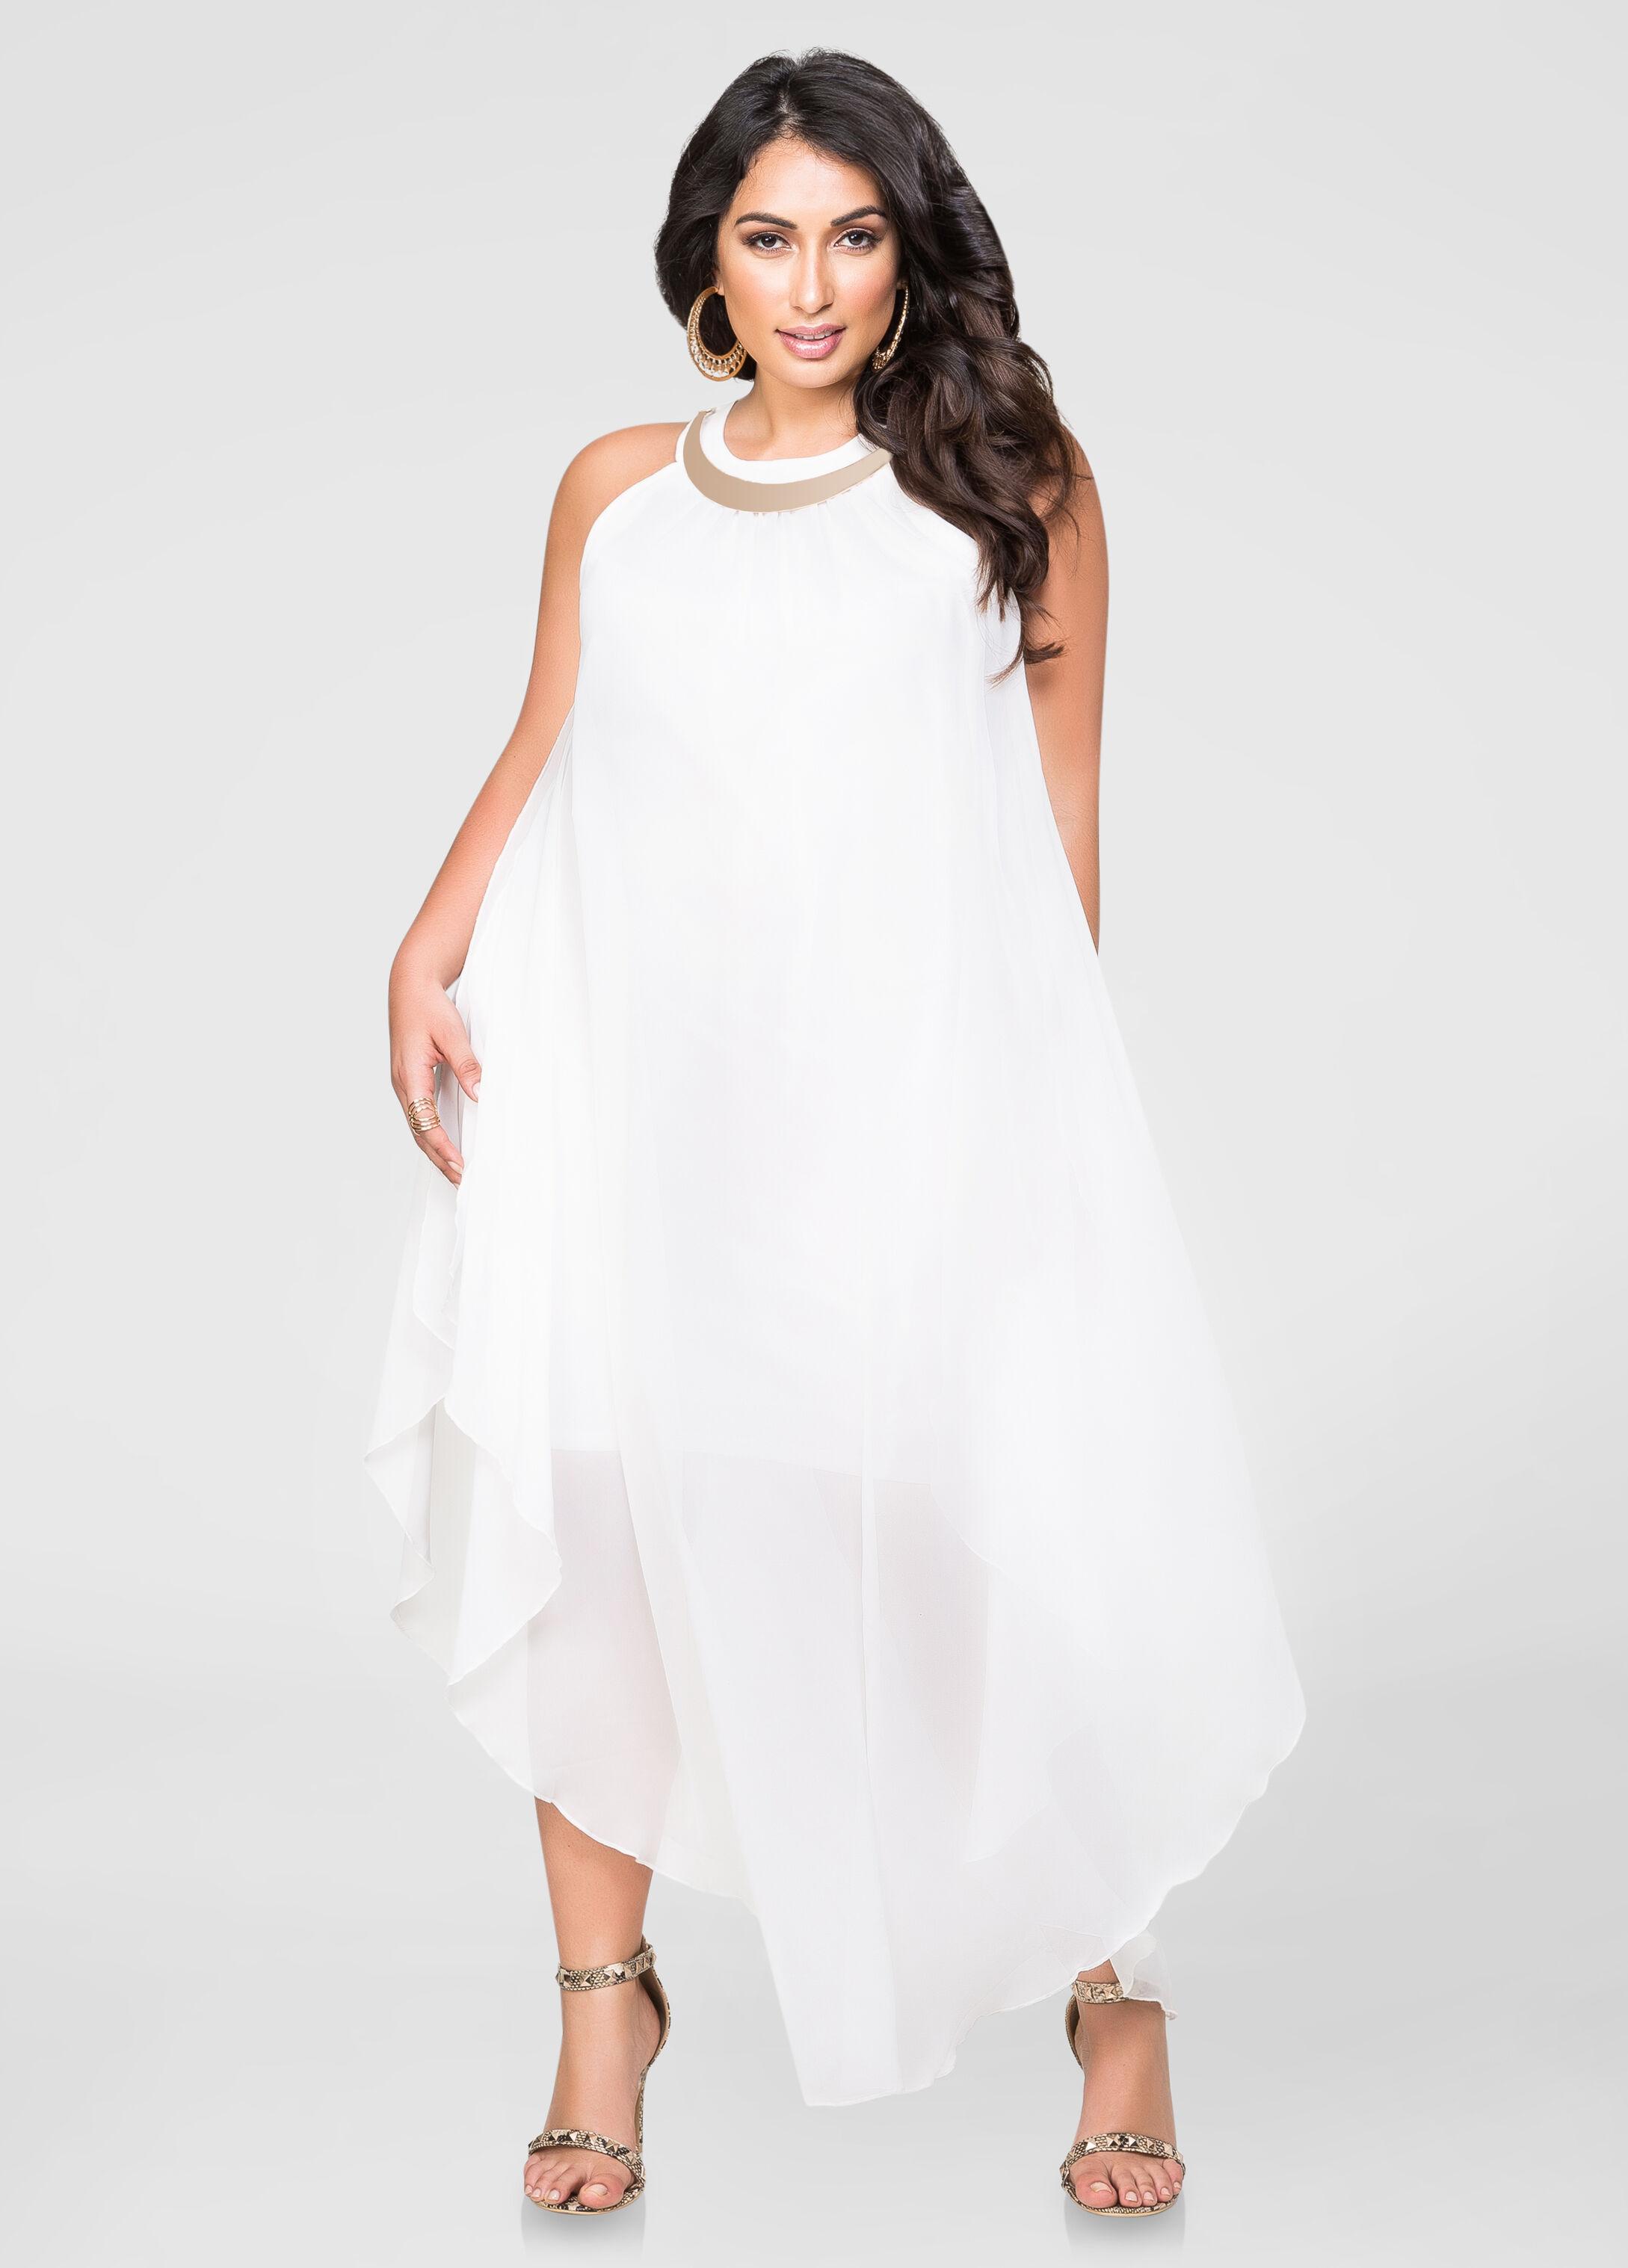 Goddess gold bar maxi dress plus size dresses ashley Ashley stewart wedding dresses